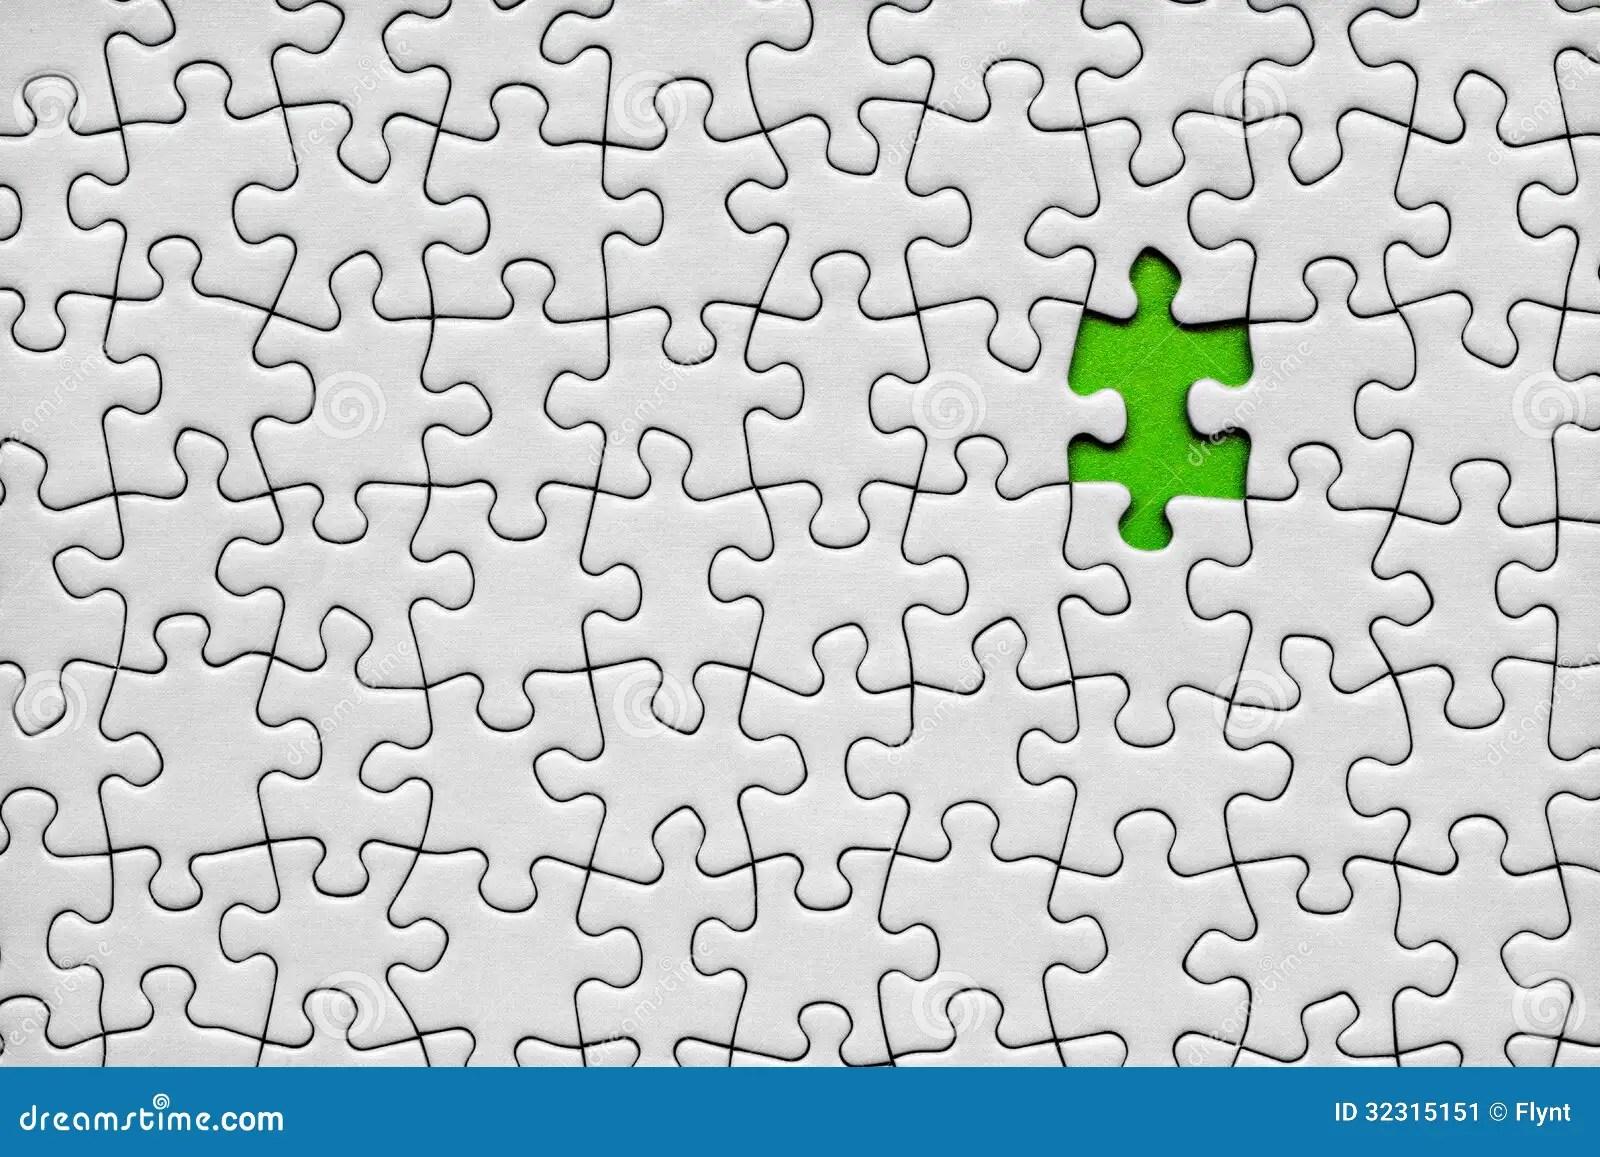 Puzzle Piece Set Seamless Vector Illustration